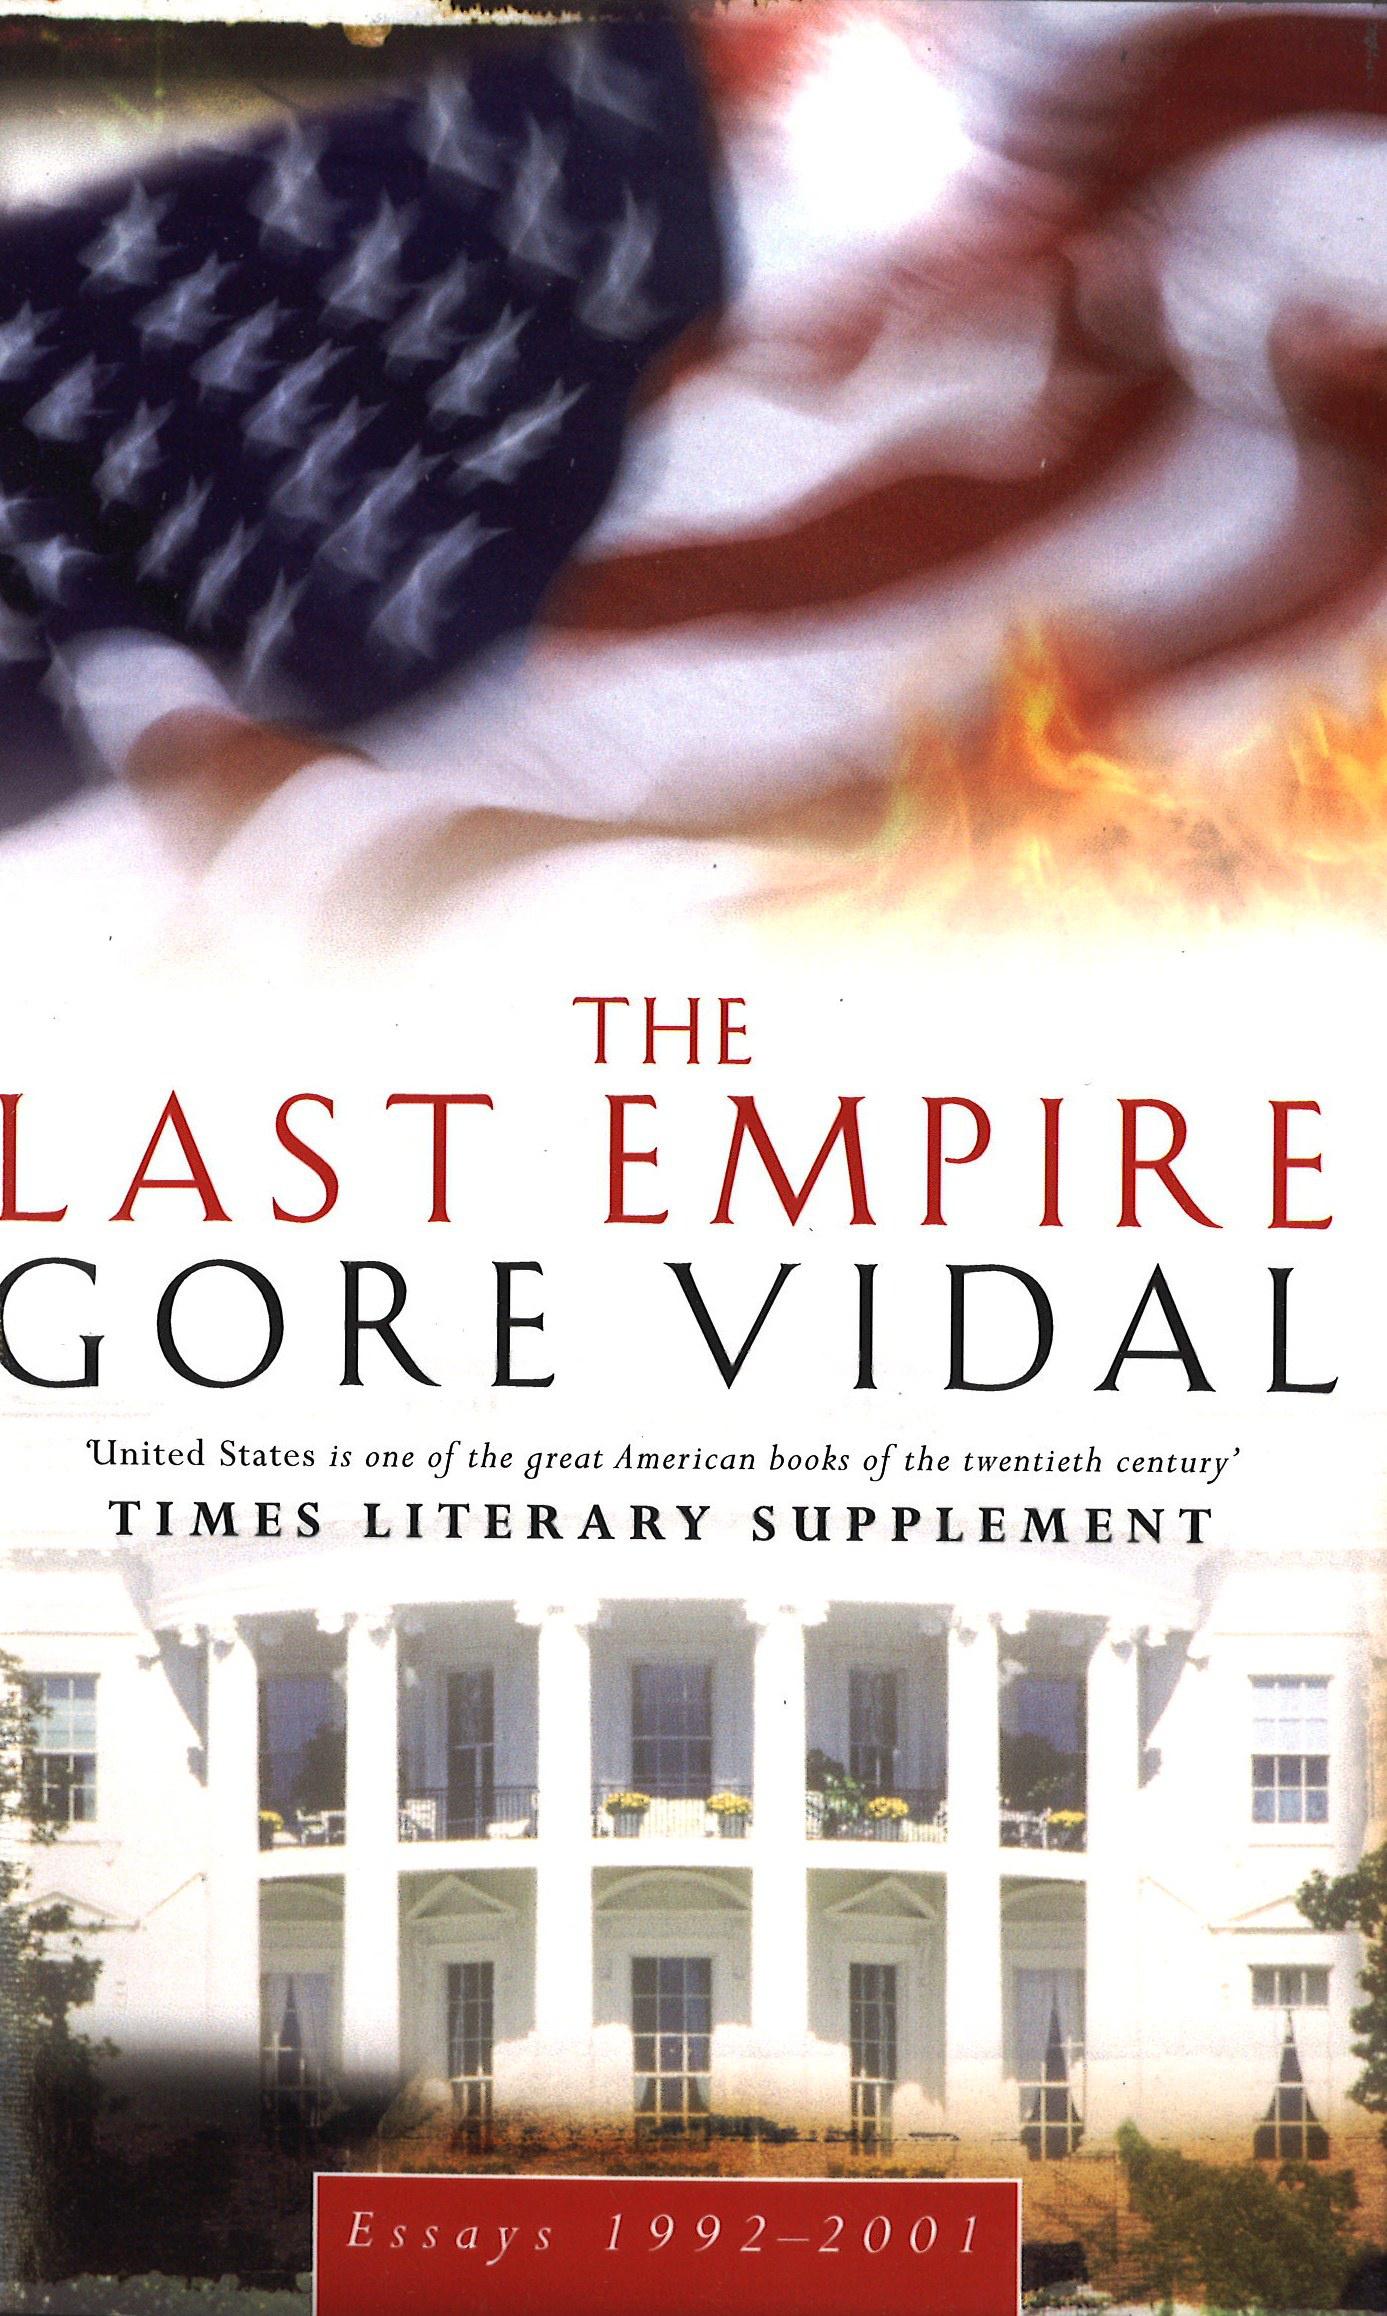 gore vidal american essays